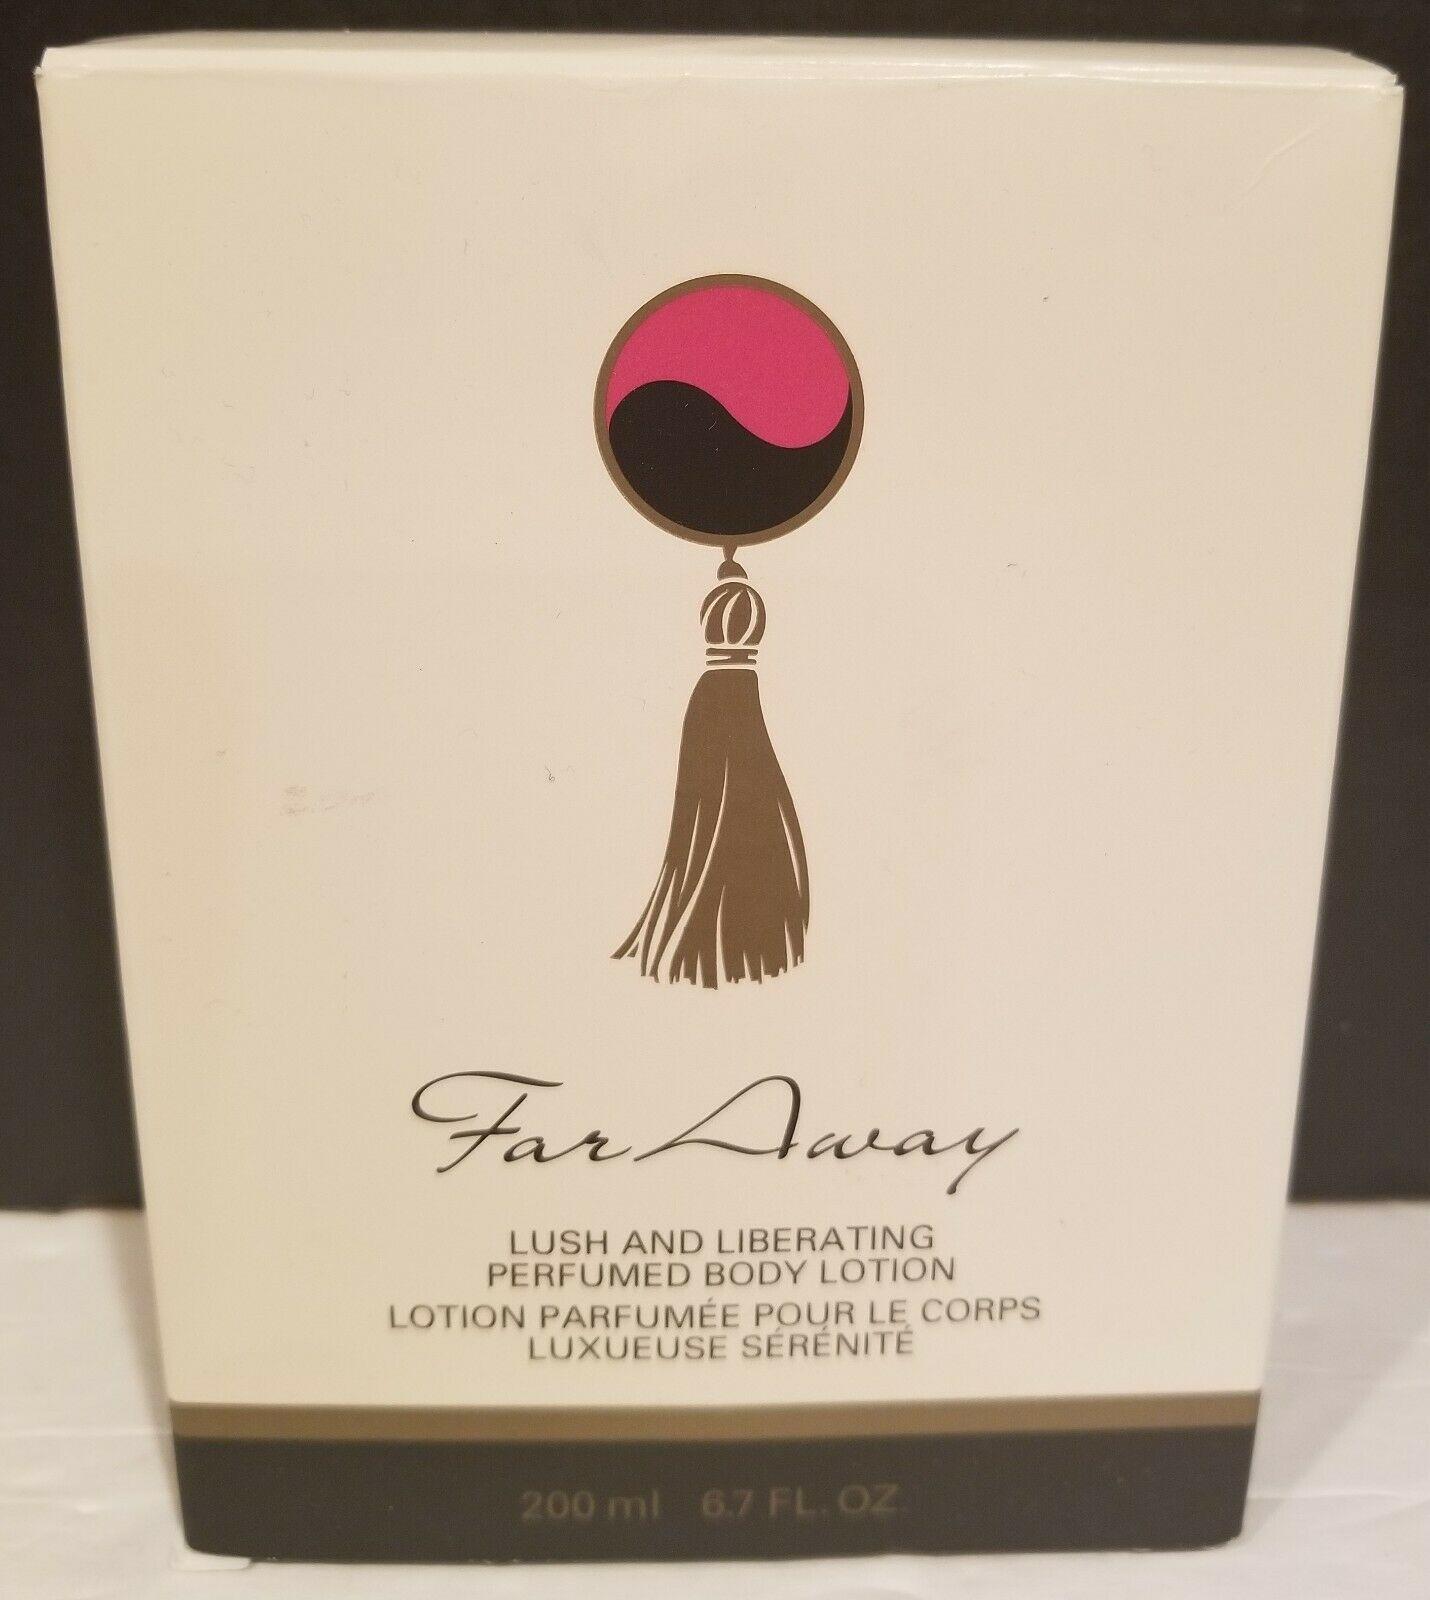 Avon Far Away Lush and Liberating Perfumed Body Lotion 6.7 Fl oz.